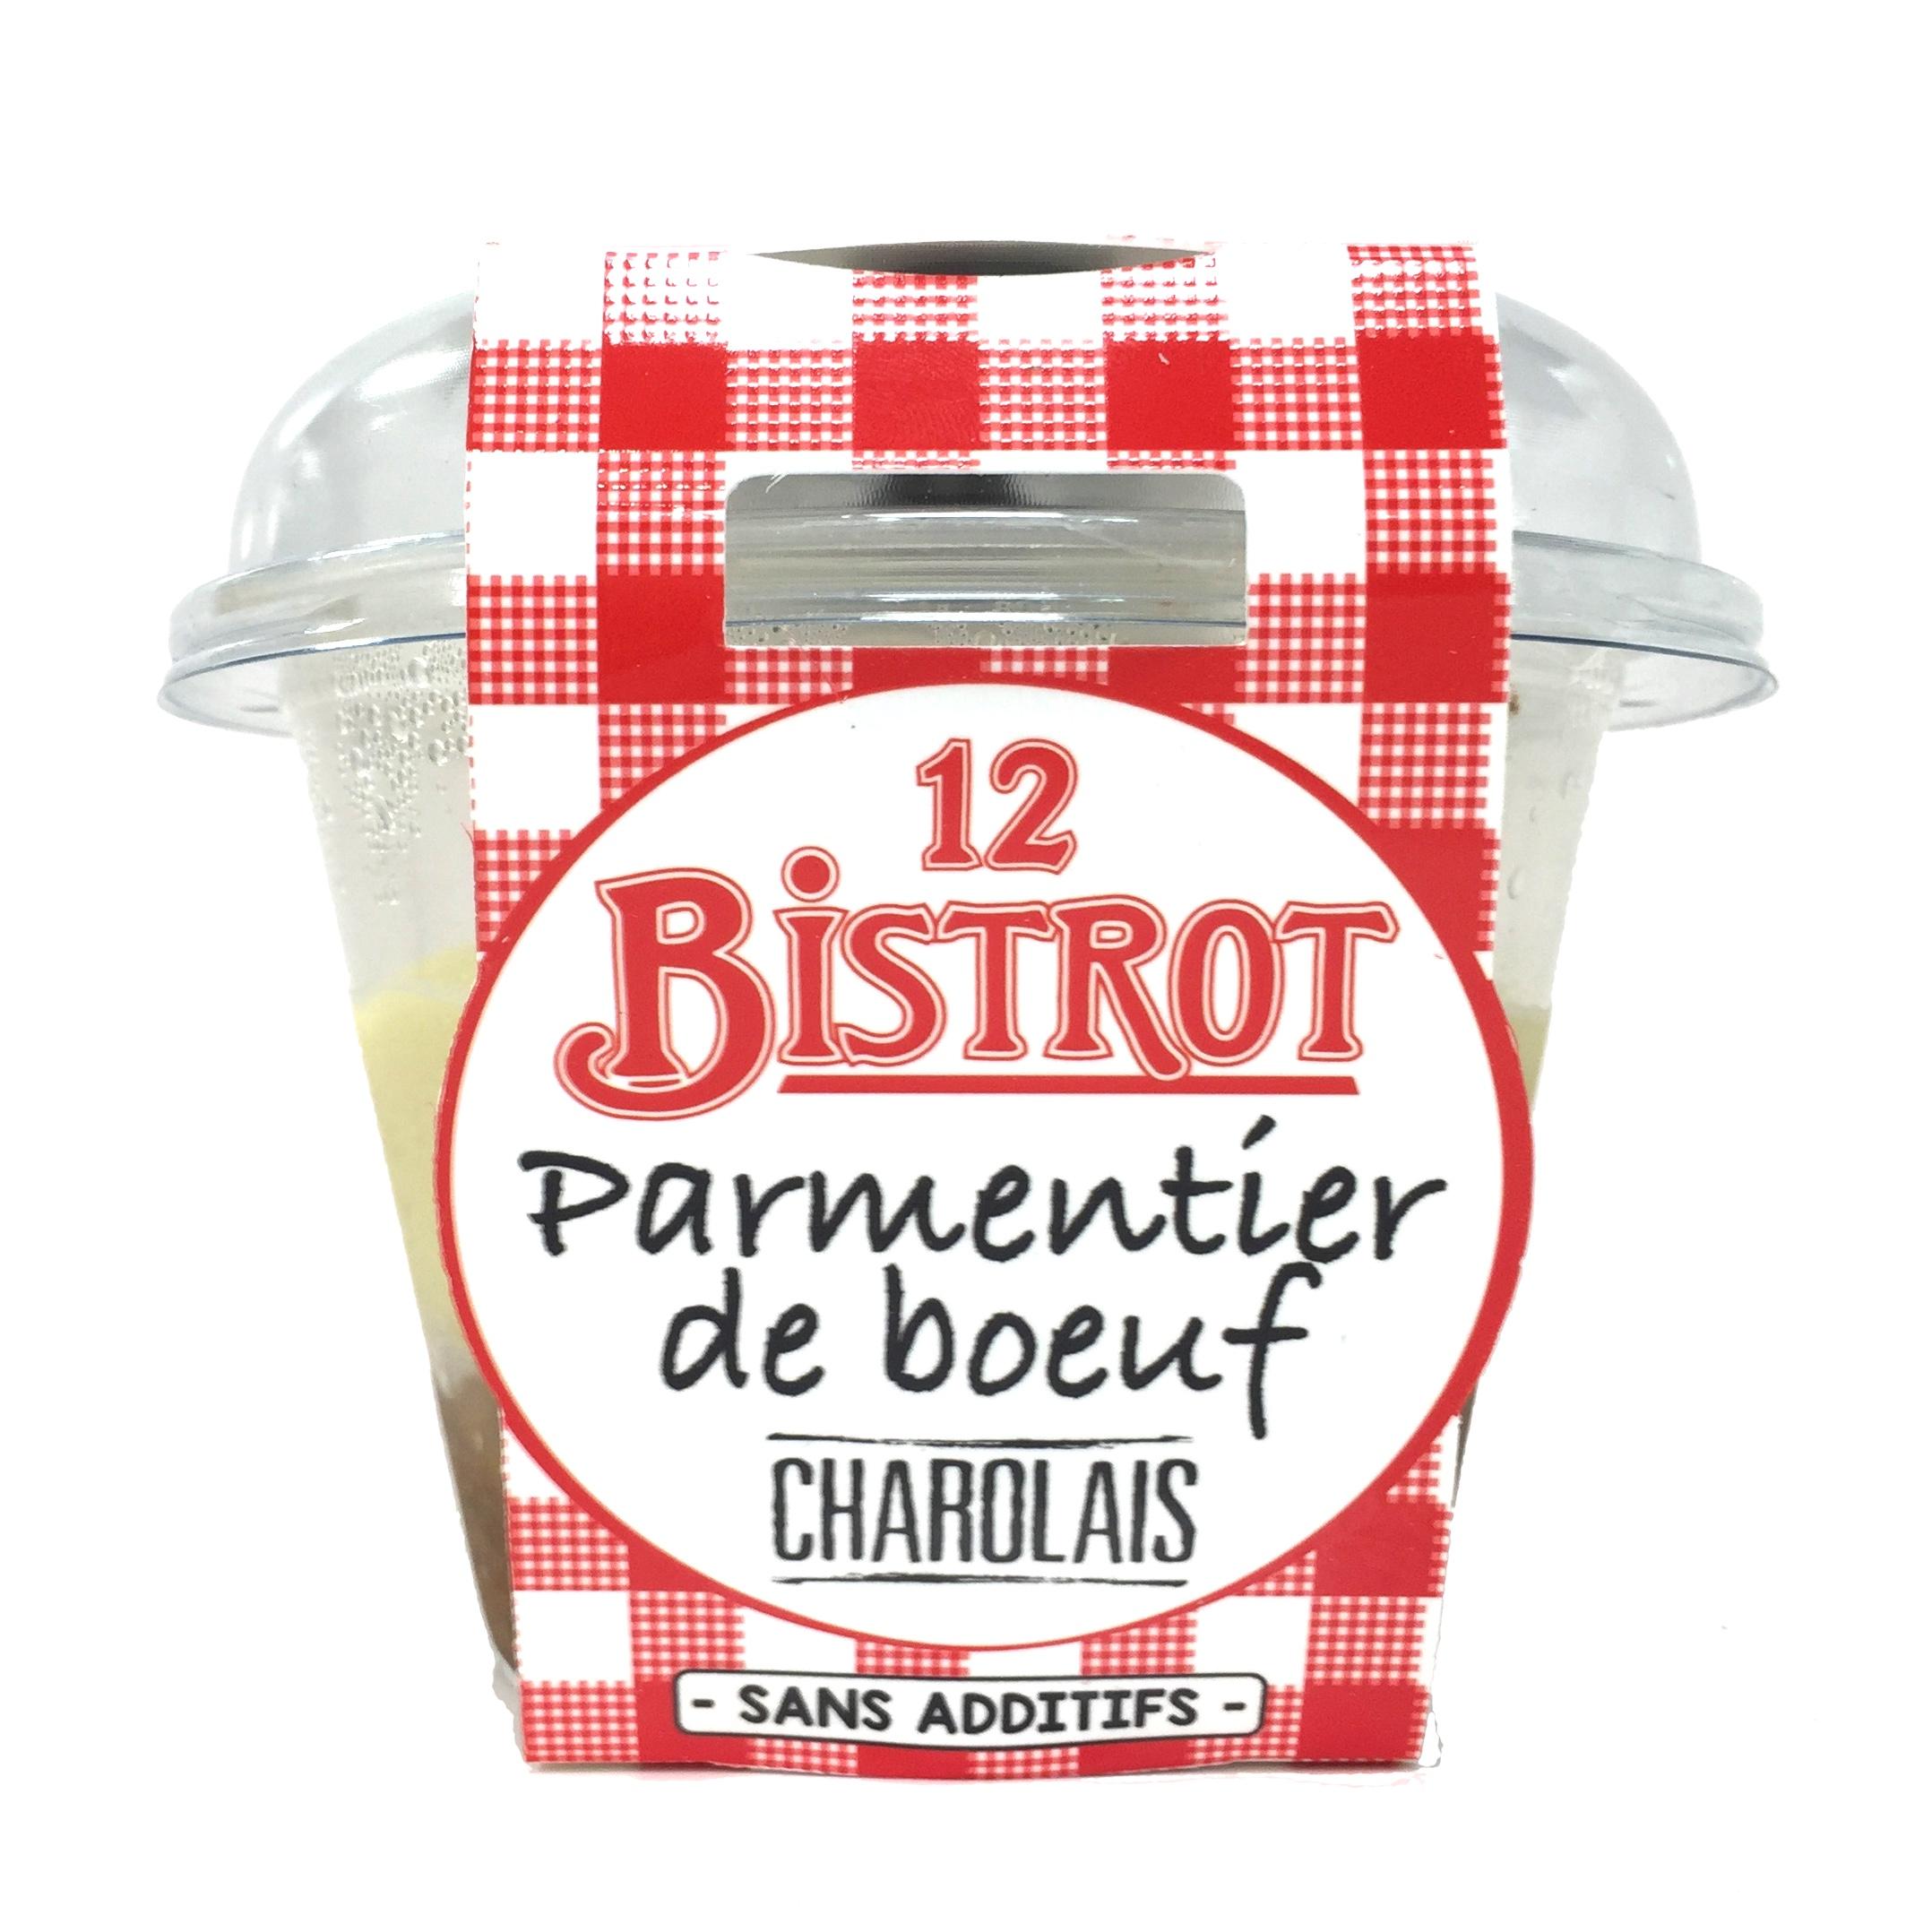 Parmentier de boeuf charolais, Bistrot12 (300 g)